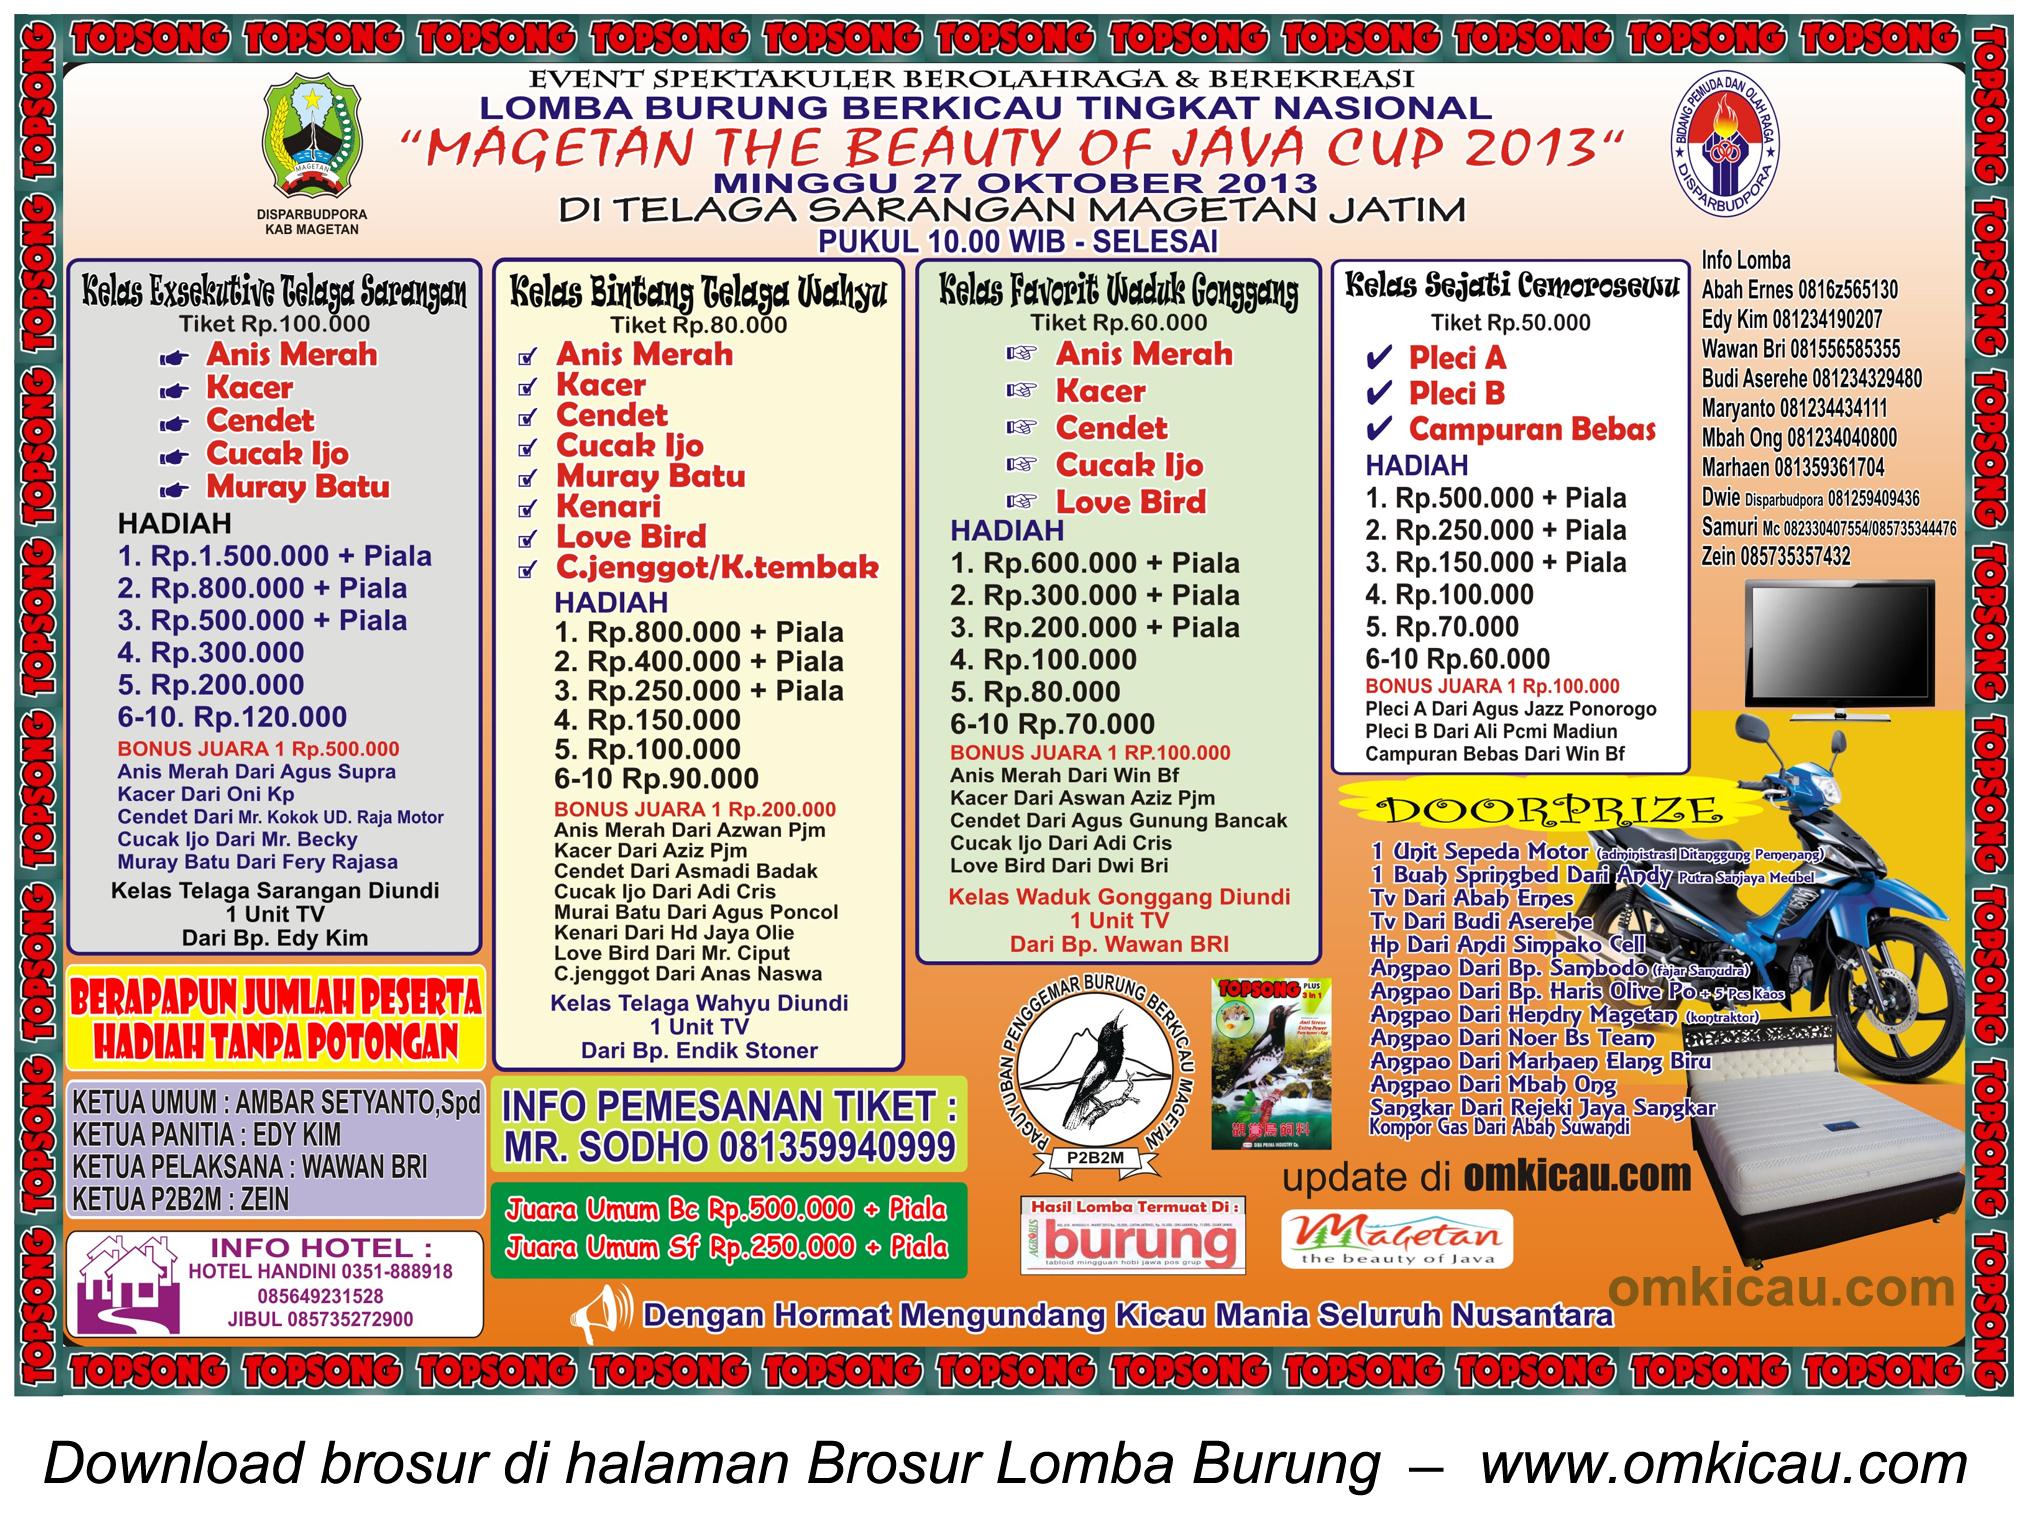 Brosur Lomba Burung Magetan The Beauty of Java Cup, 27 Oktober 2013